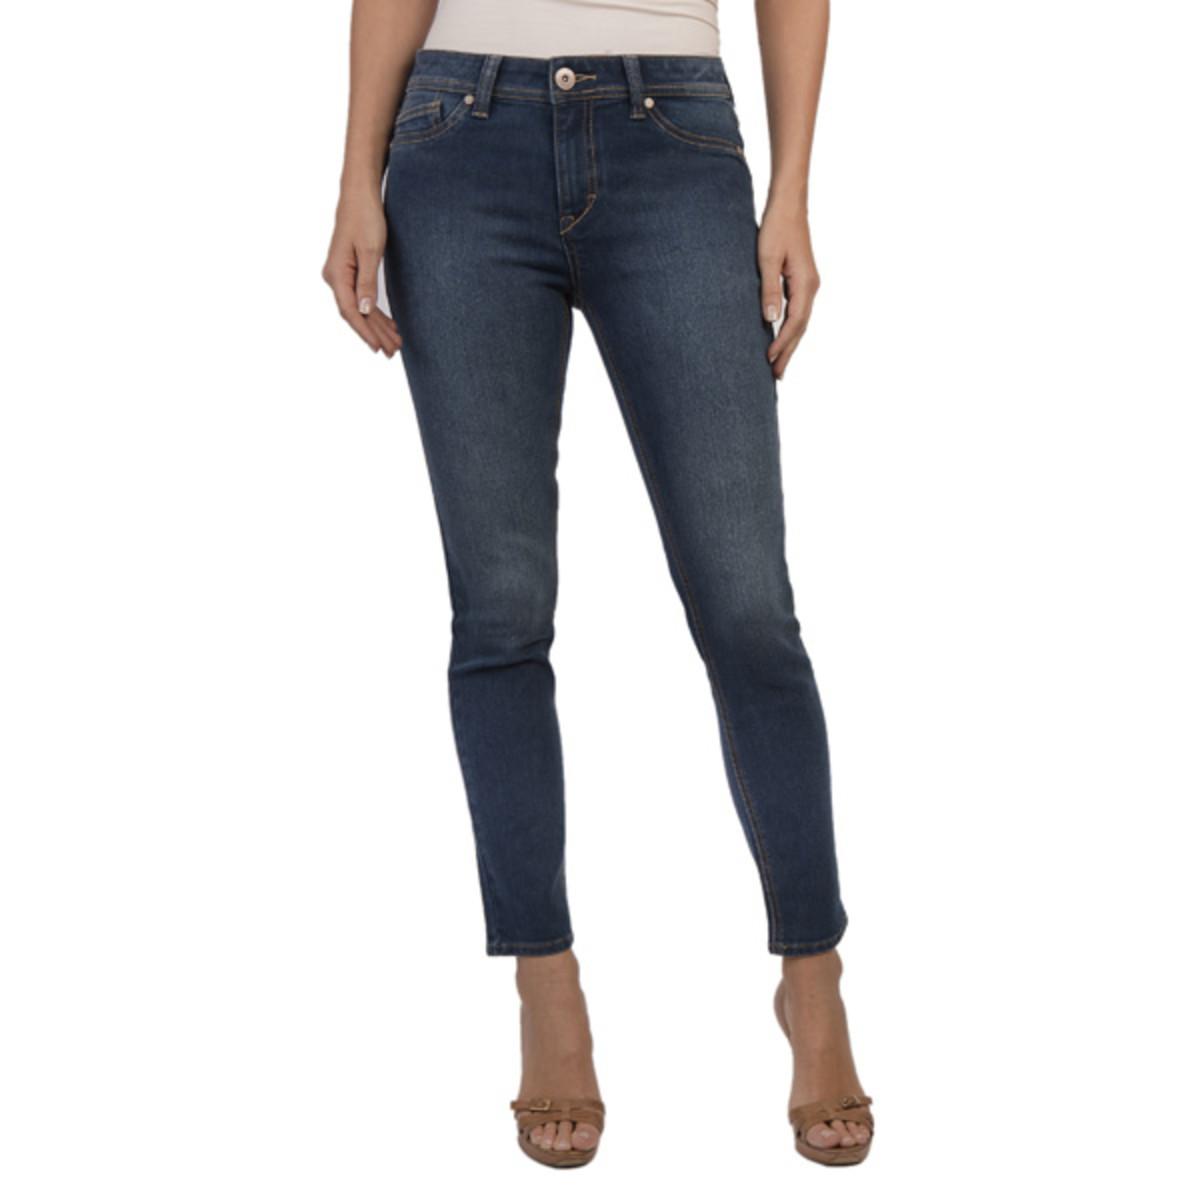 jeans giveaway Archives - MomTrendsMomTrends